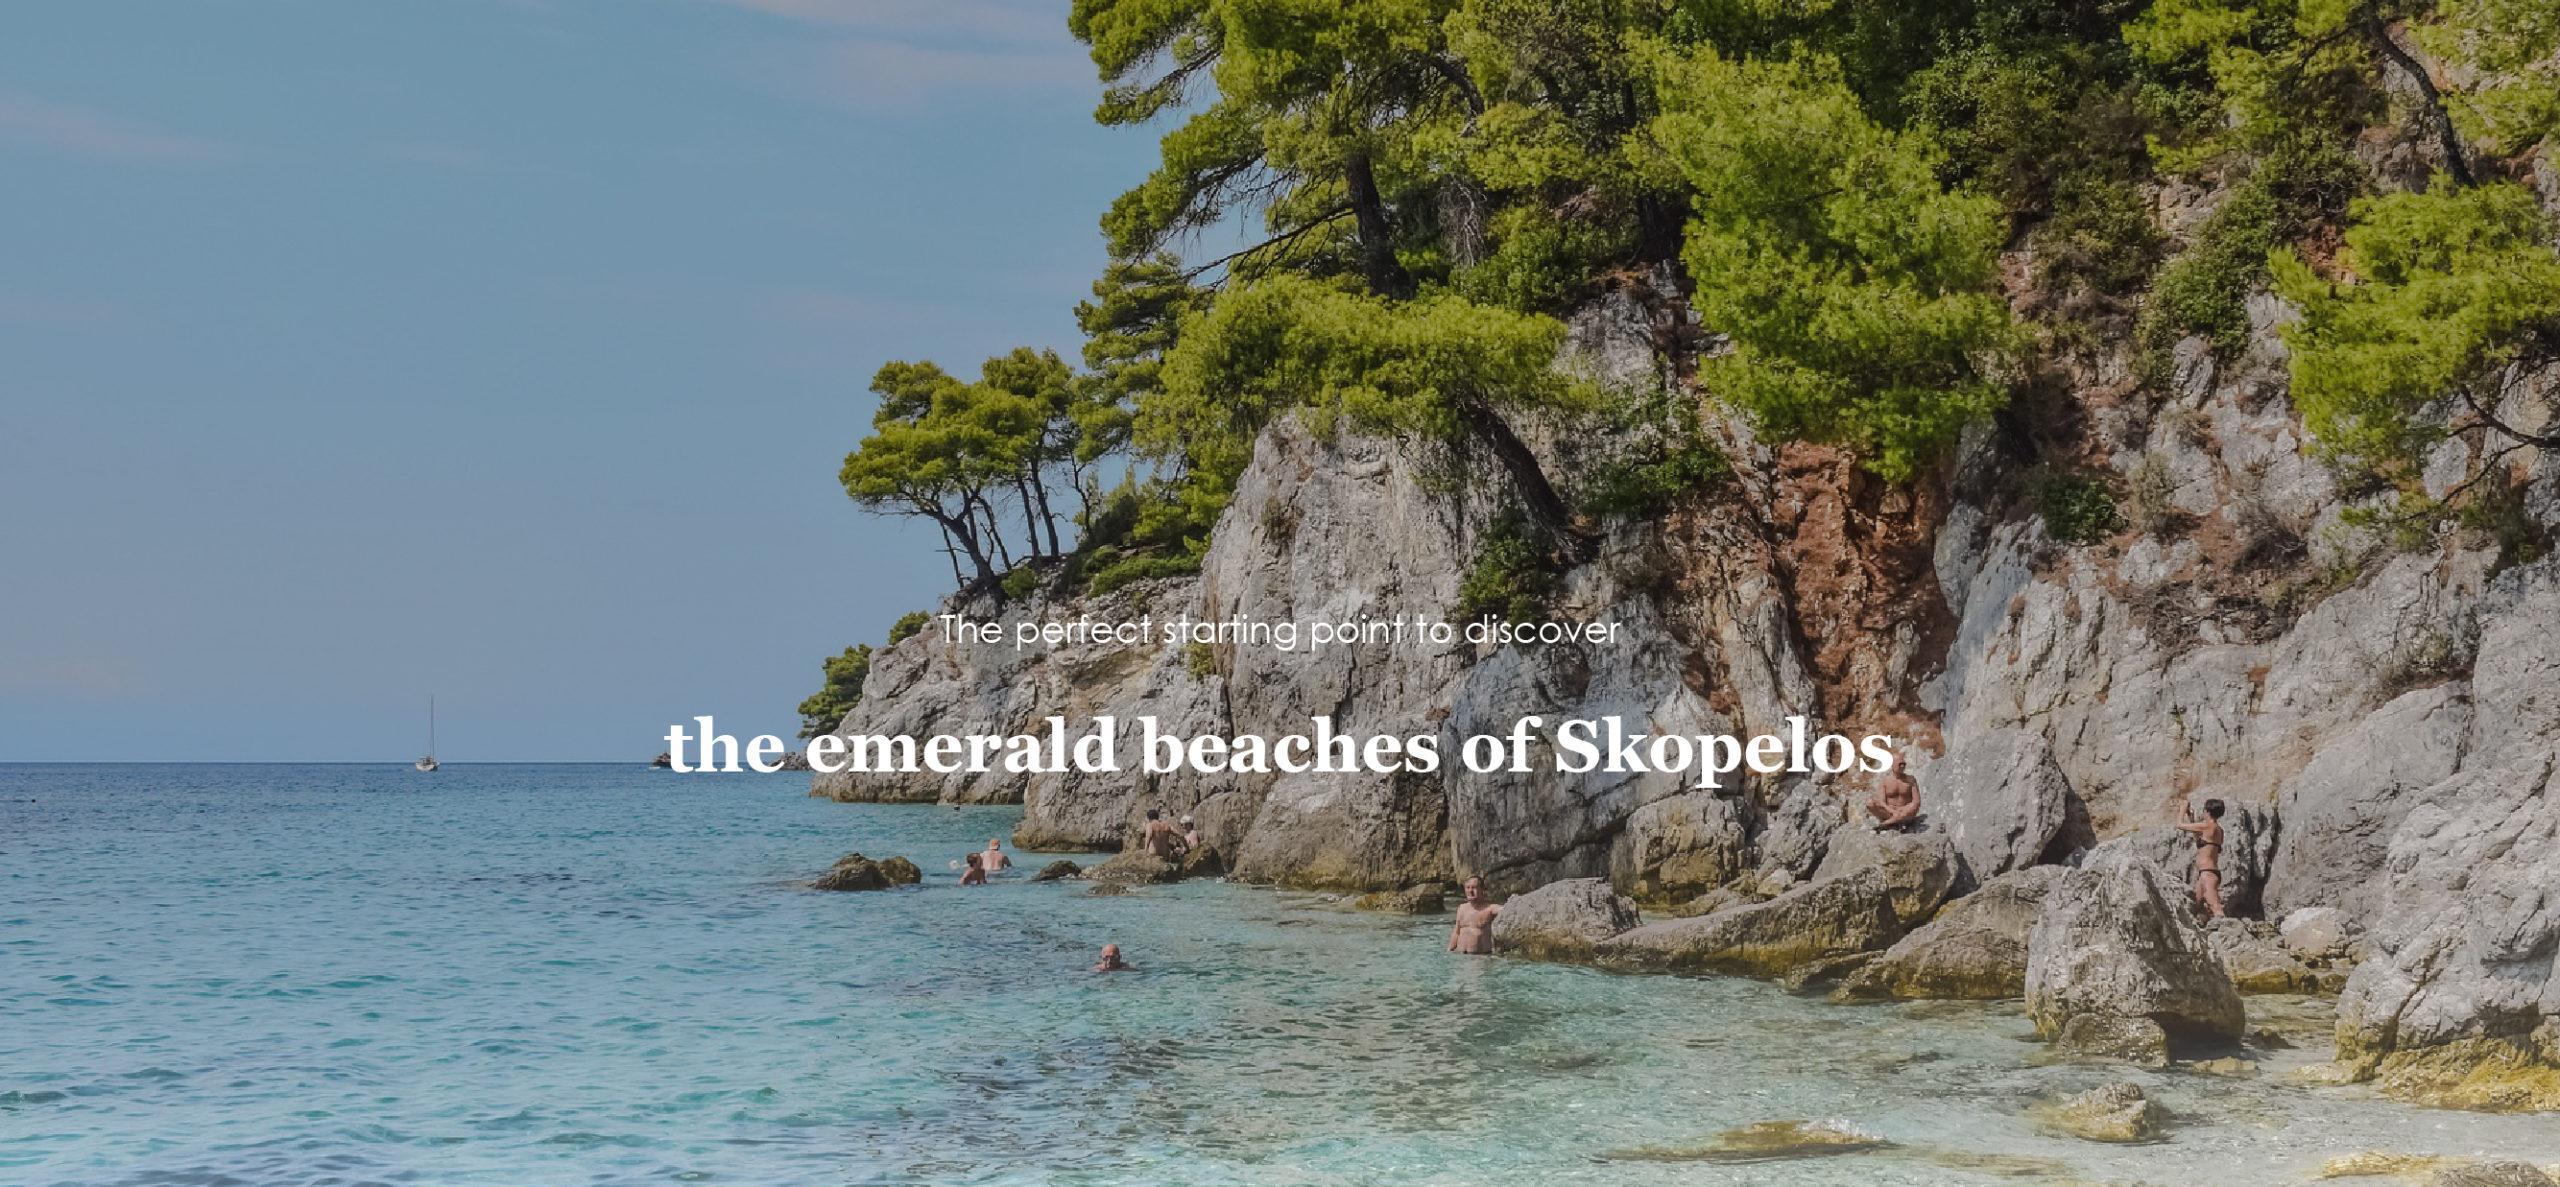 Hotel on the island of Skopelos